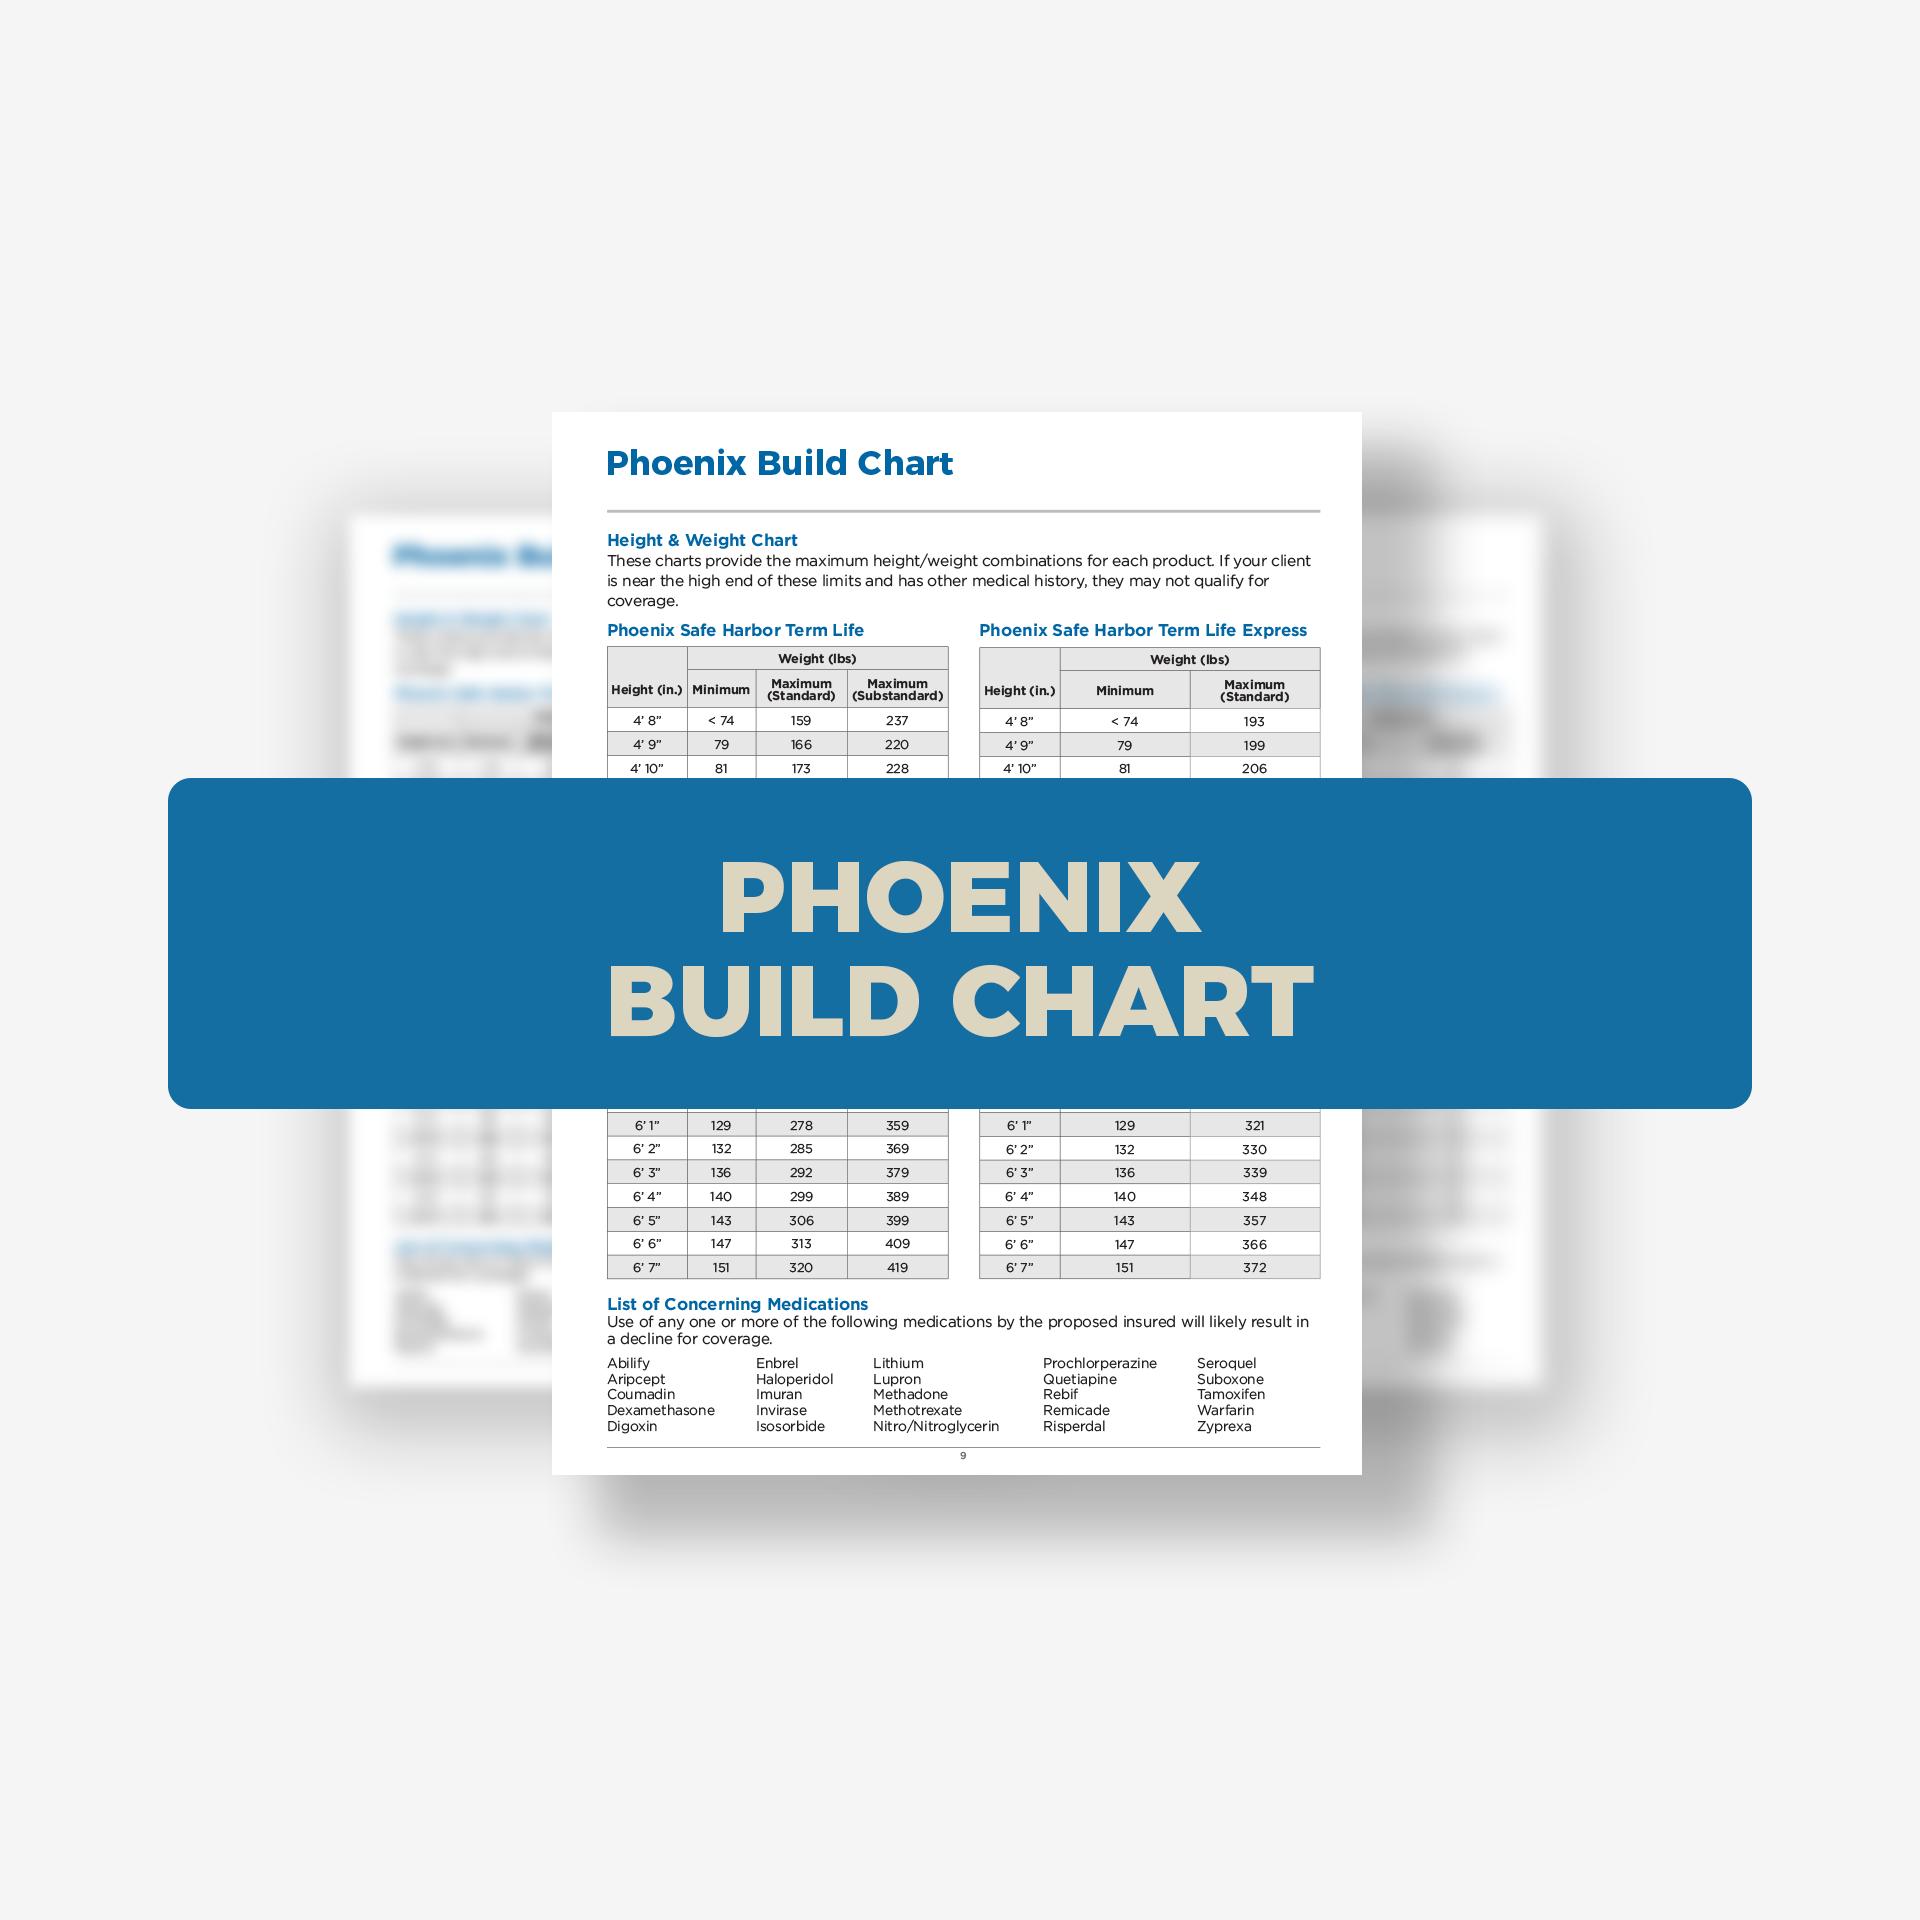 Phoenix Build Chart.png